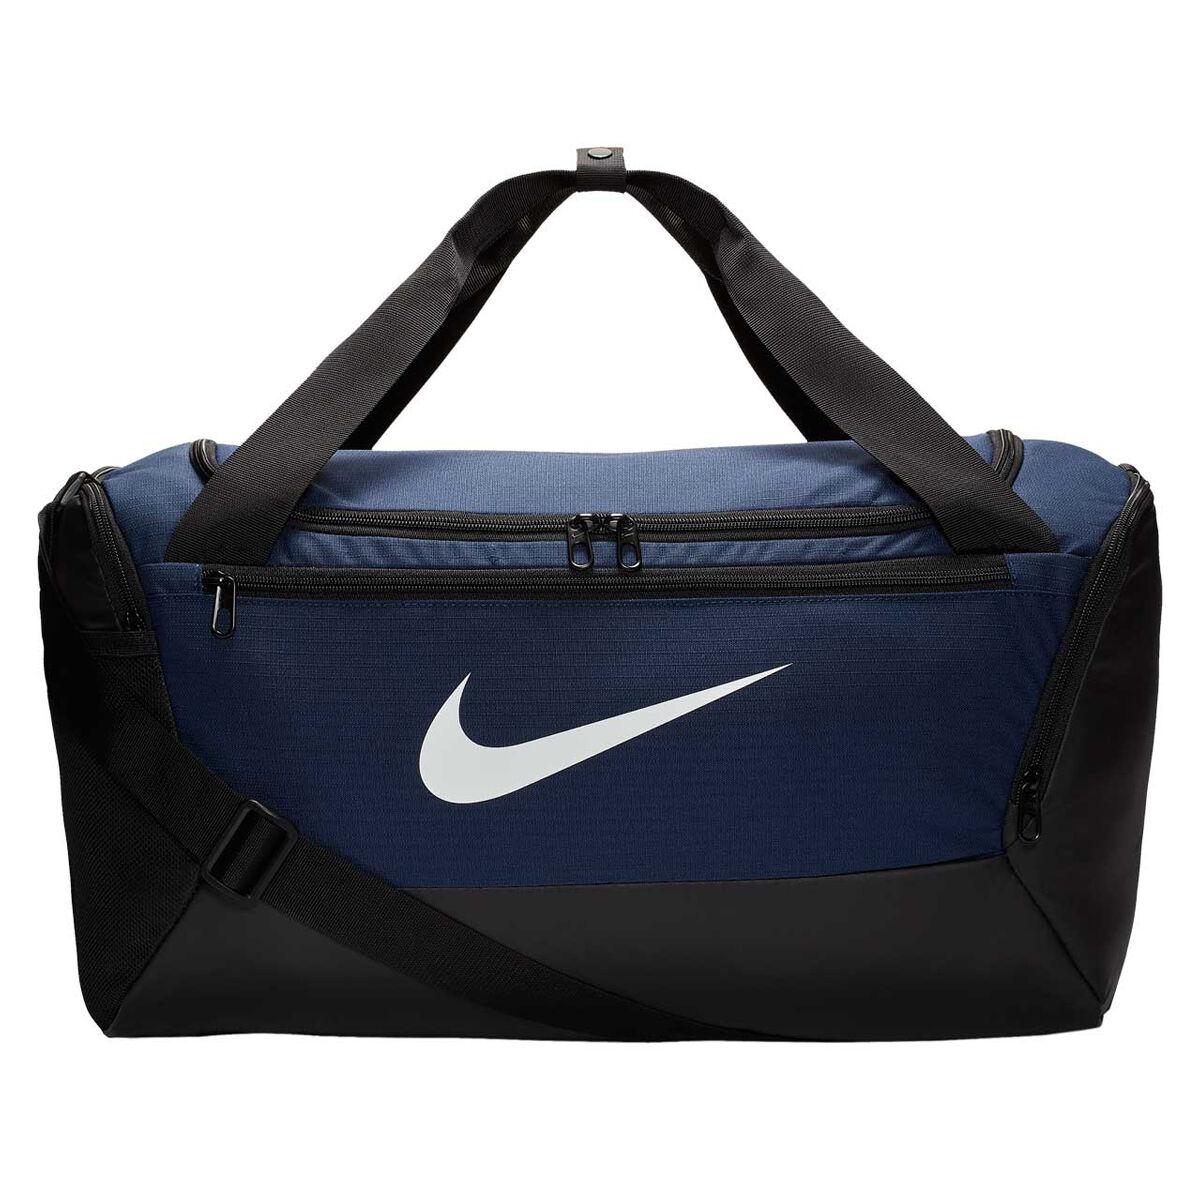 Nike X Small Brasilia Training Duffel Bag – Sioux Soccer